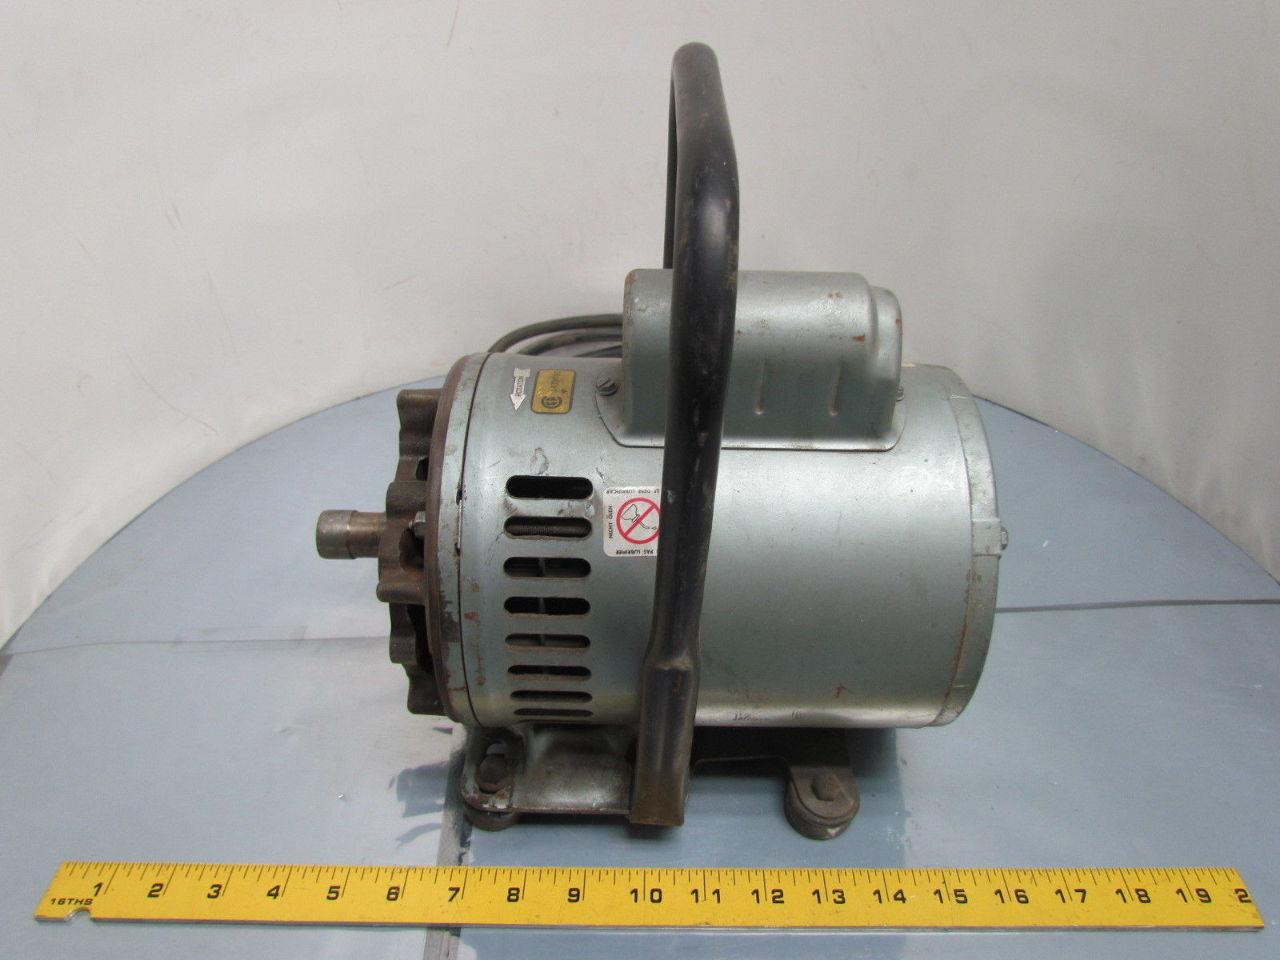 Doerr Emerson Electric Motor Wiring Diagram Wiring